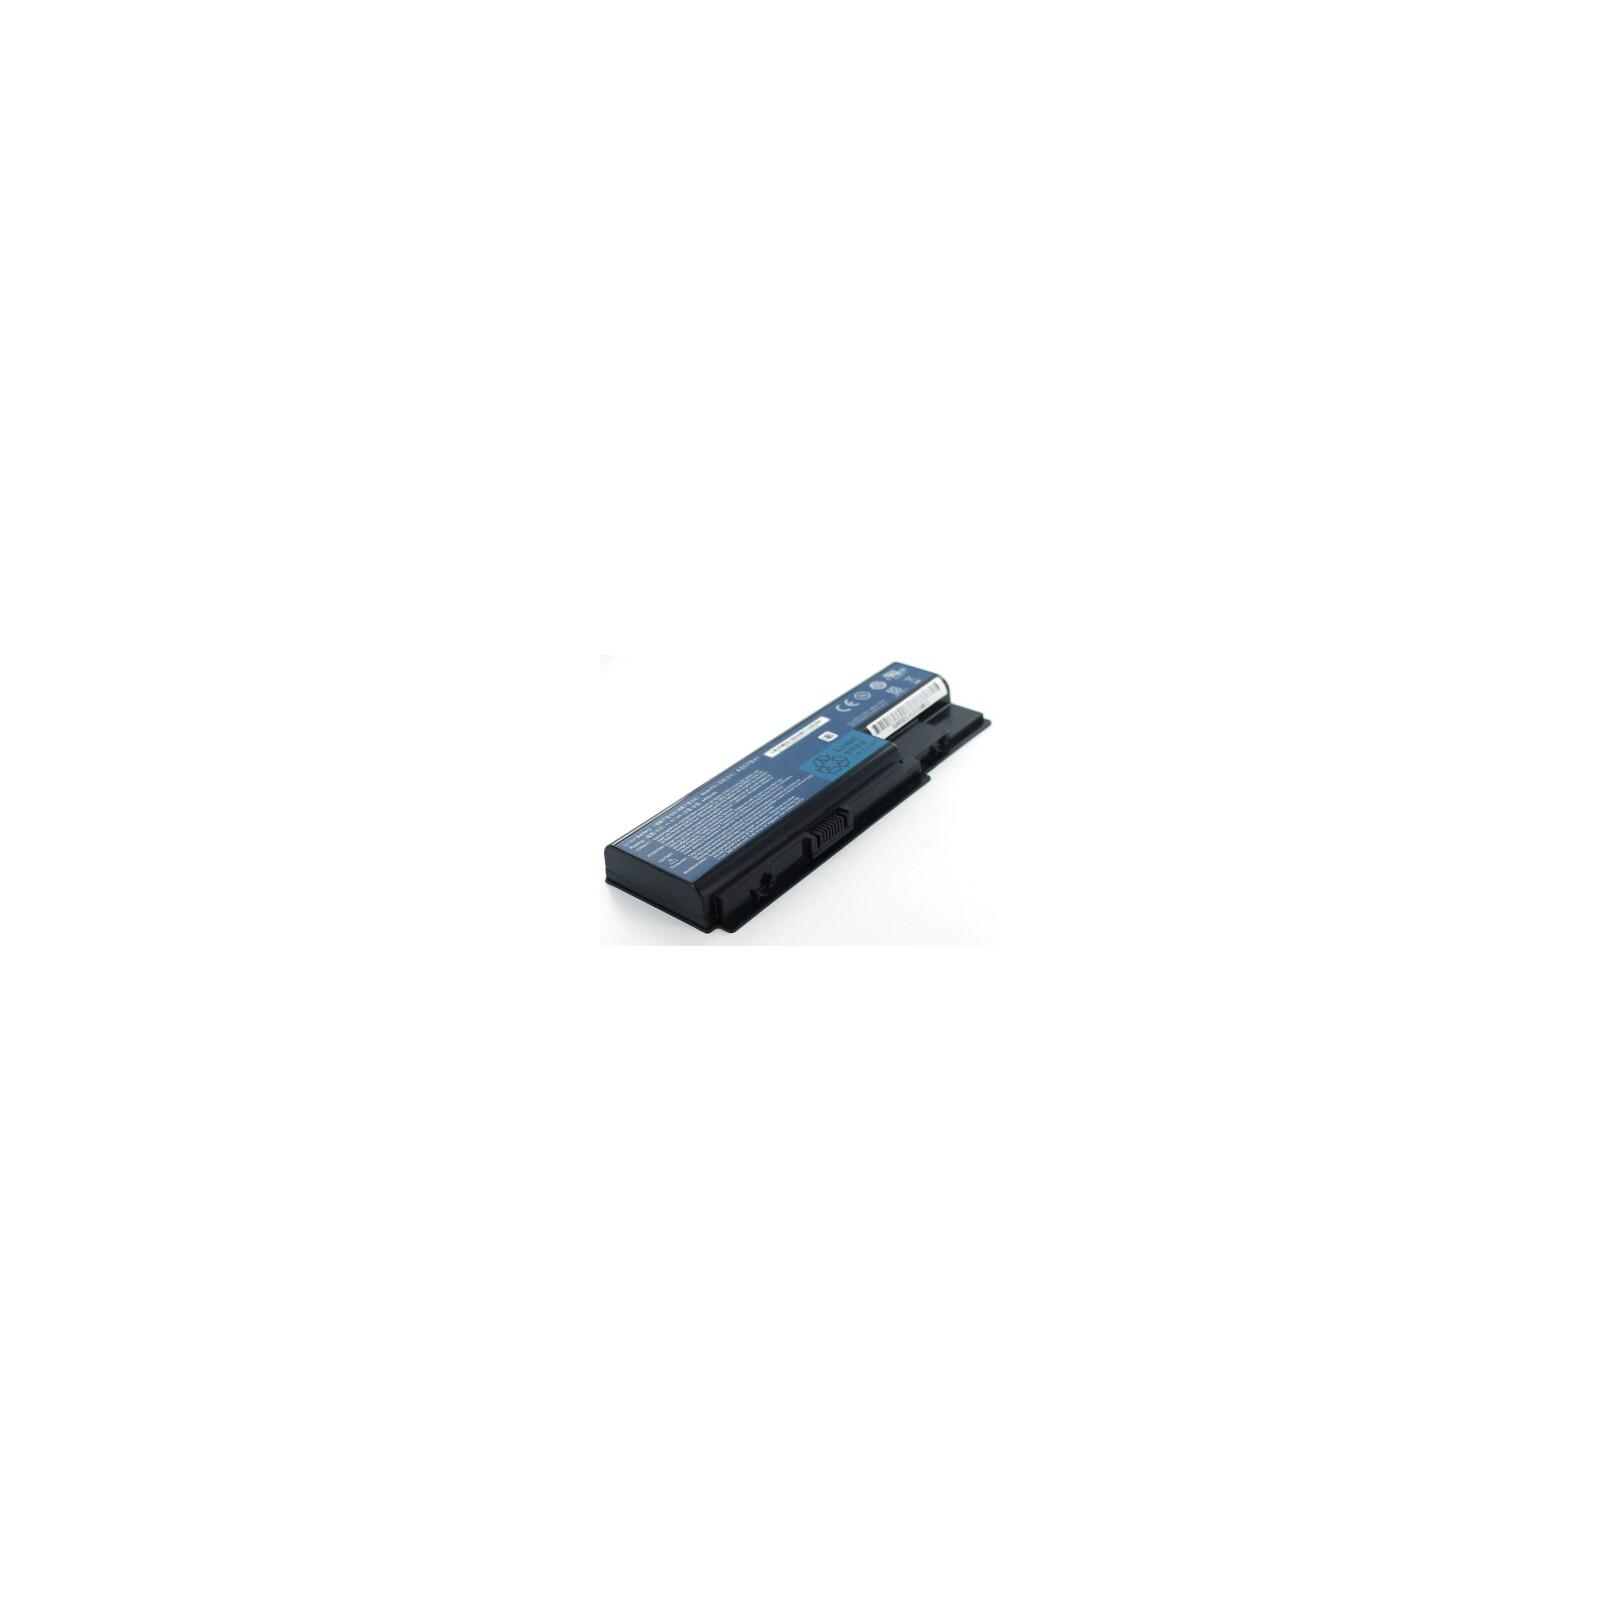 AGI Akku Acer Aspire 7736ZG-444G32MN